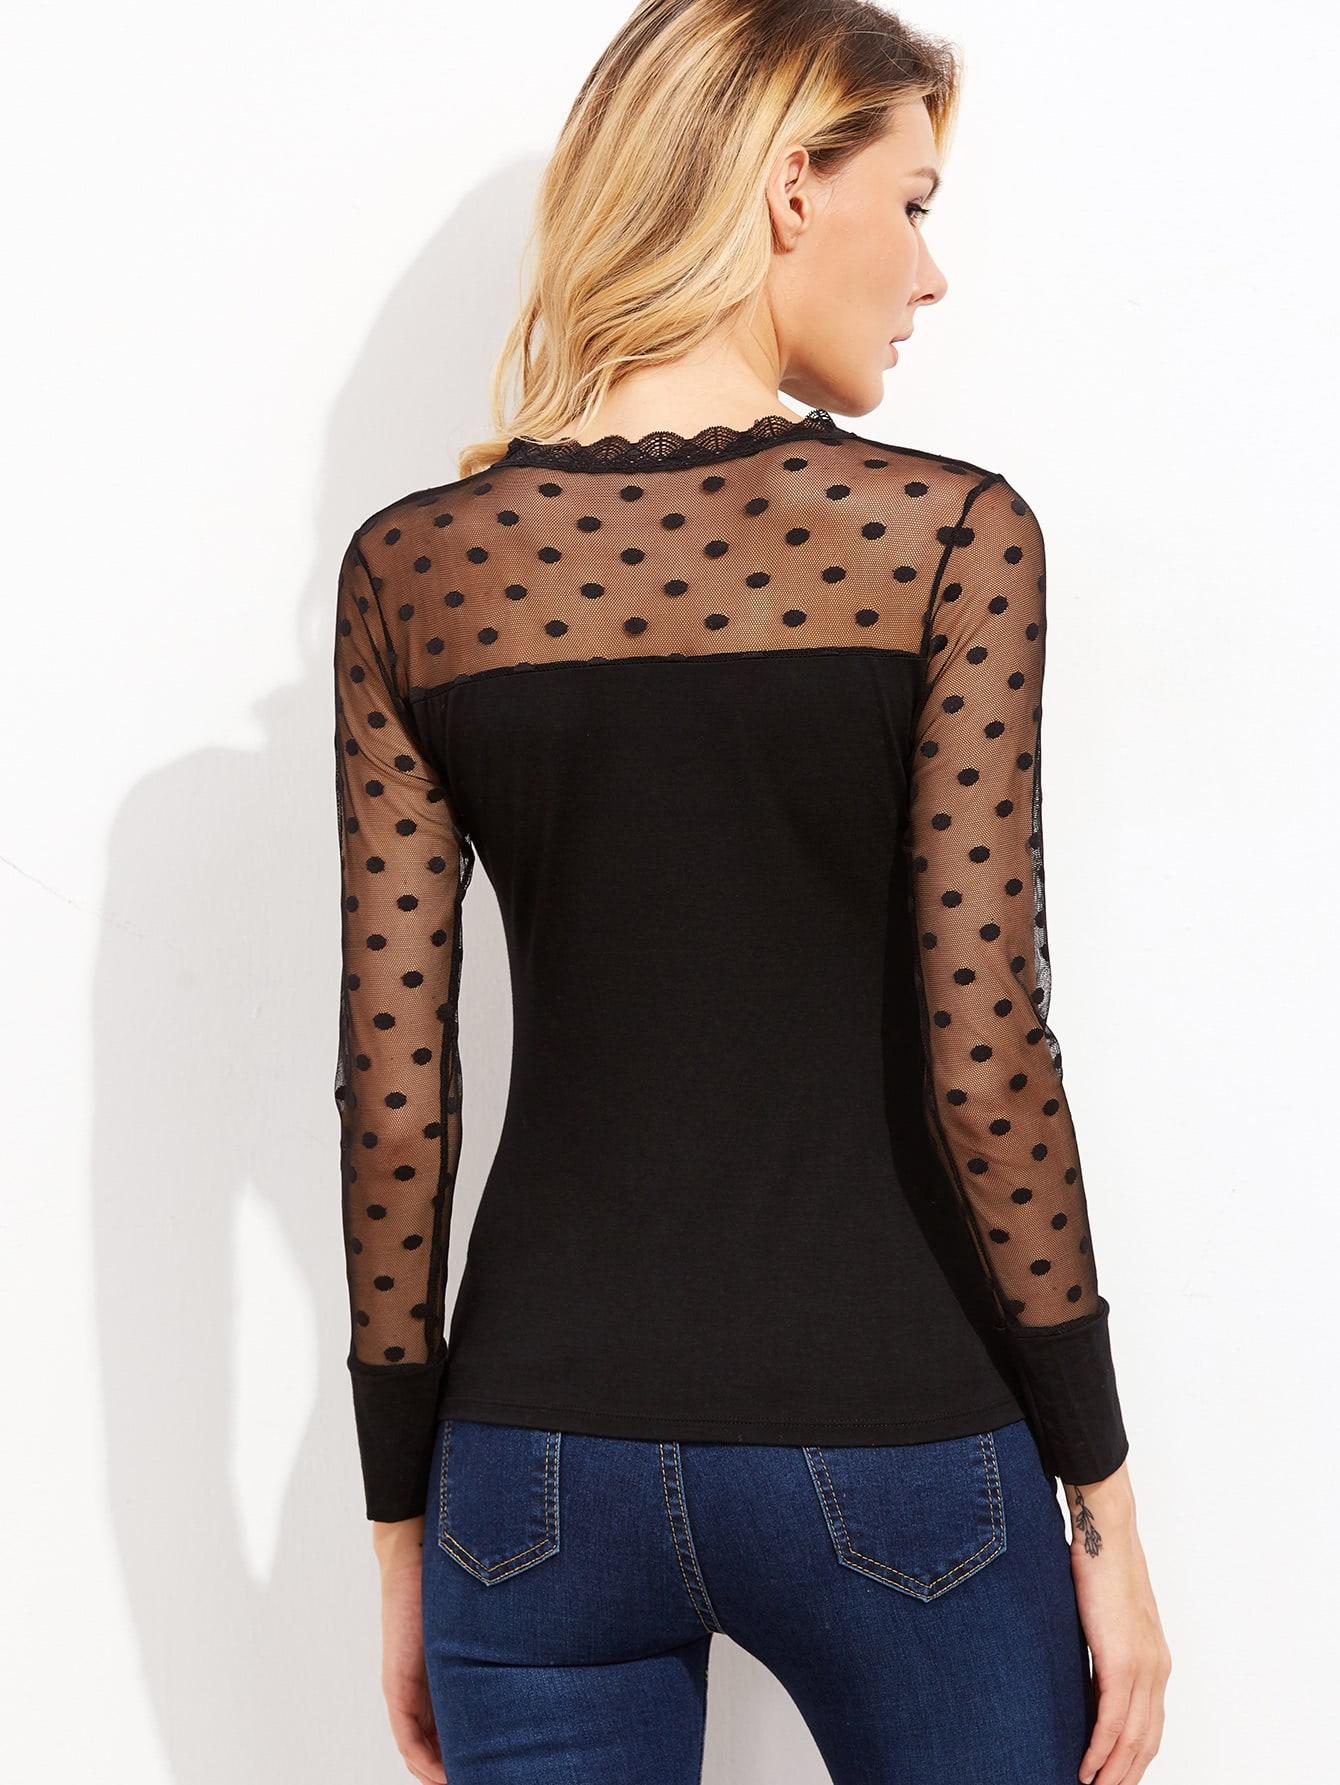 blouse160923006_2